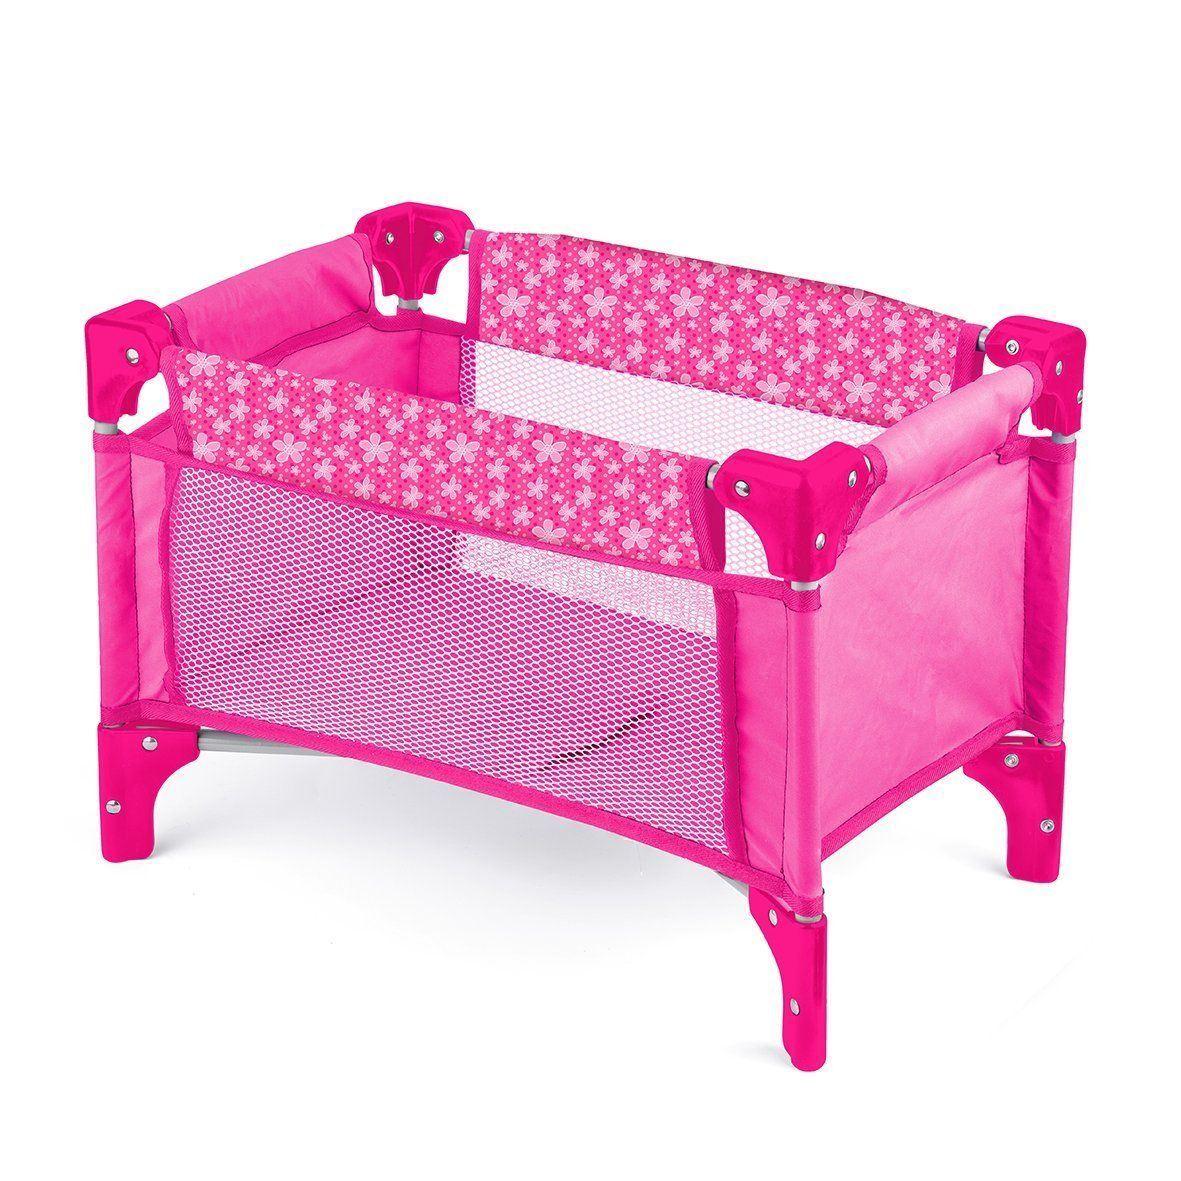 New-Deluxe-Dolls-Range-Pram-Buggy-Walker-Swing-Travel-Cot-High-Chair-Kid-Fun-Toy